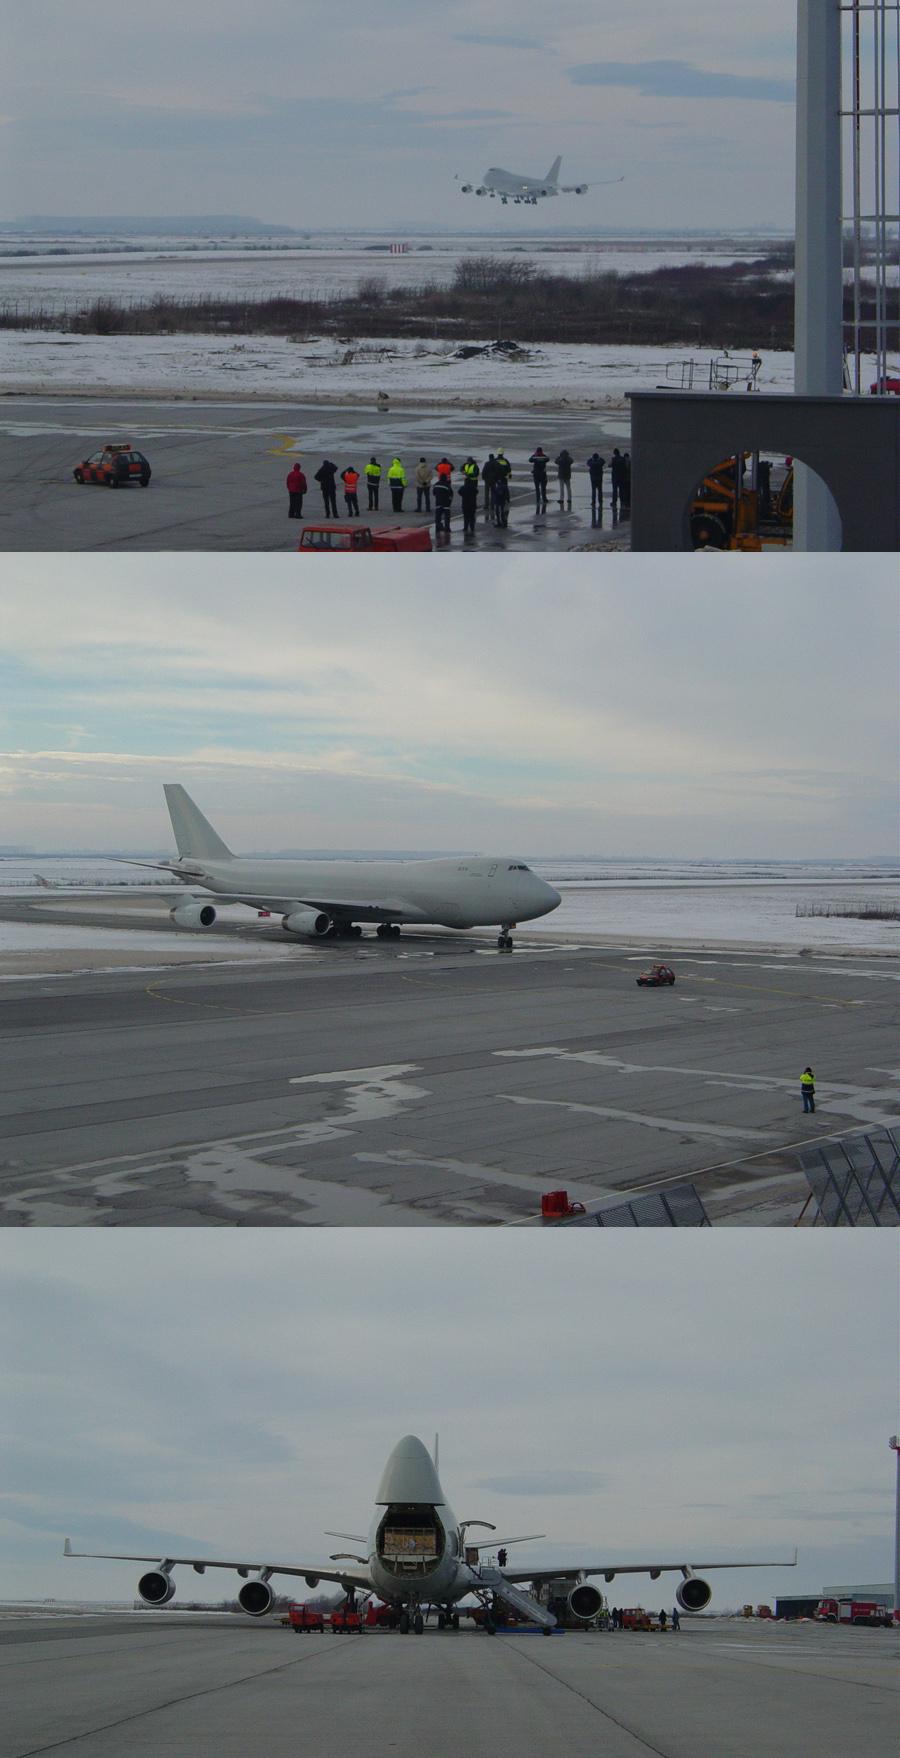 Boeing747 ponovno sletio sa junicama na ZLO  22.12.2009.   Ključne riječi: boeing747 krave kanada zlo